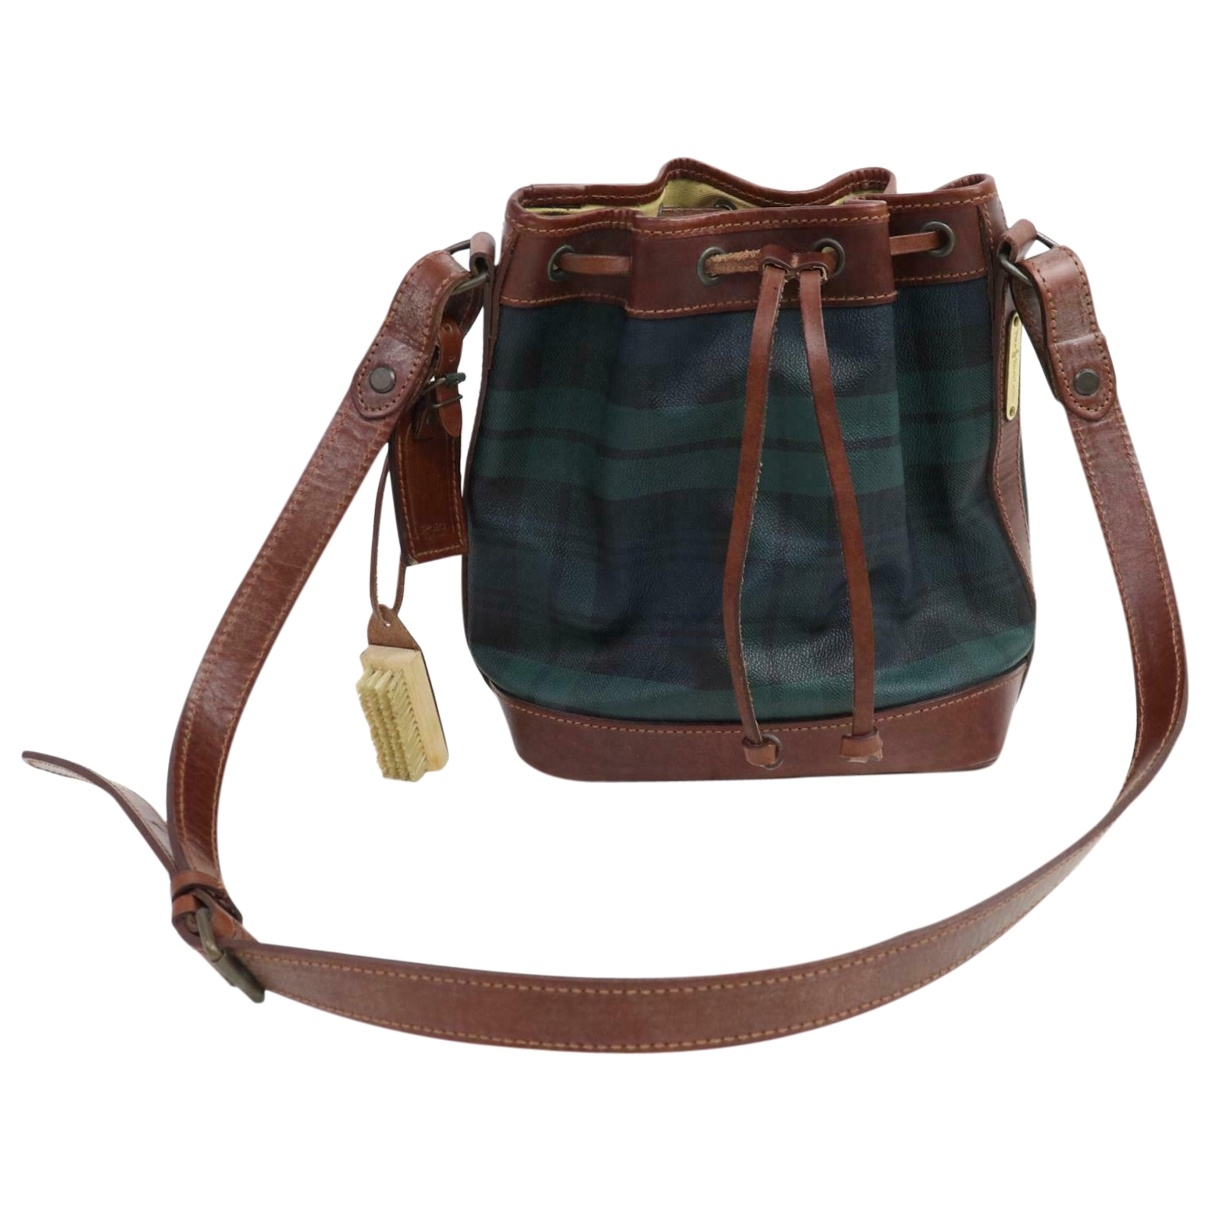 Polo Ralph Lauren \N Green handbag for Women \N